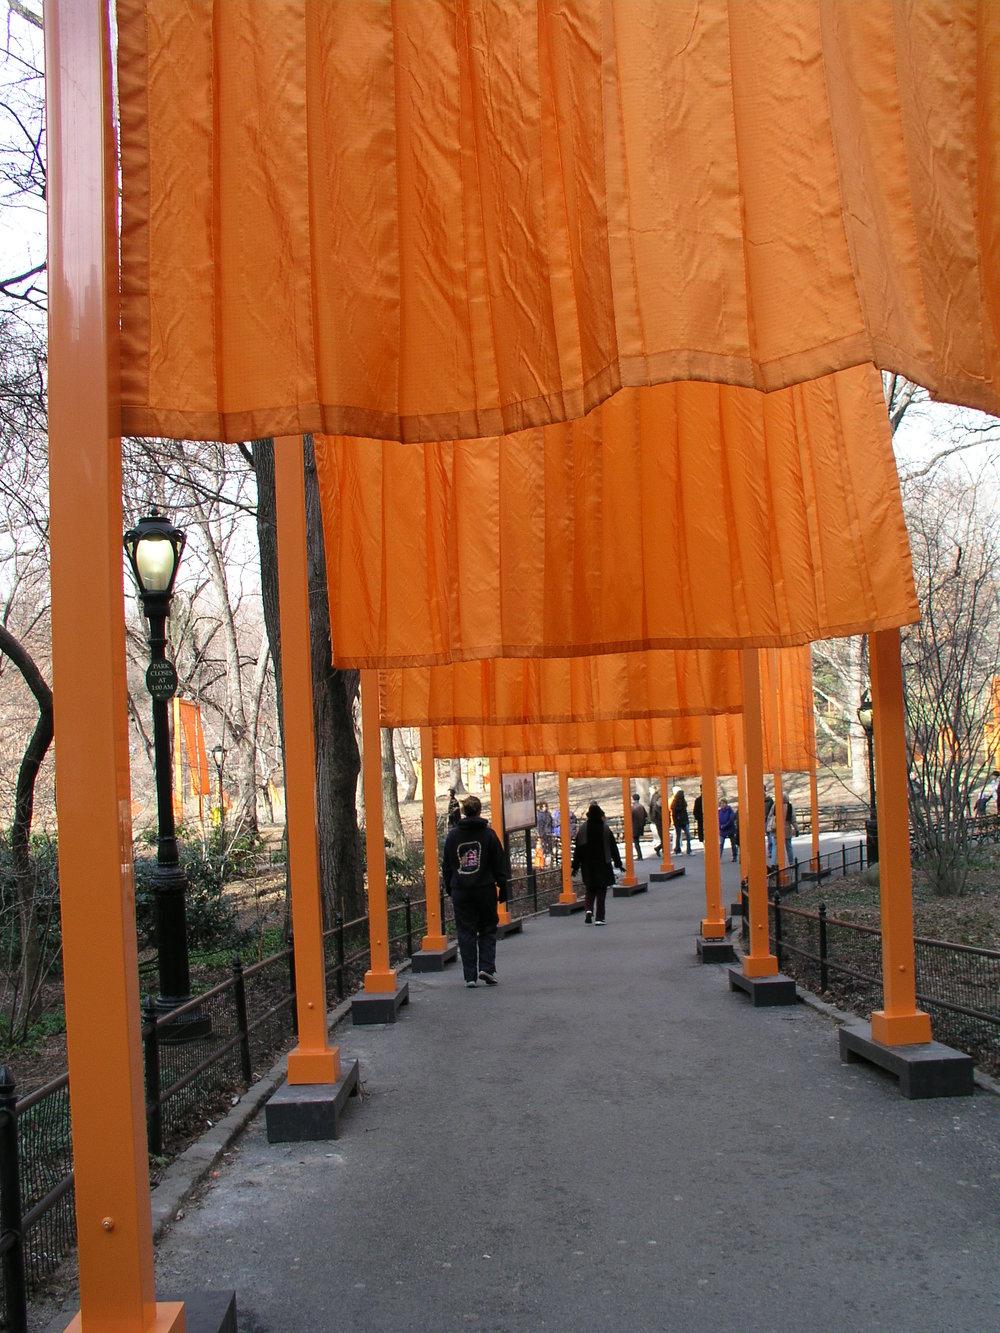 The Christo Gates 2005 in Central Park.3.JPG